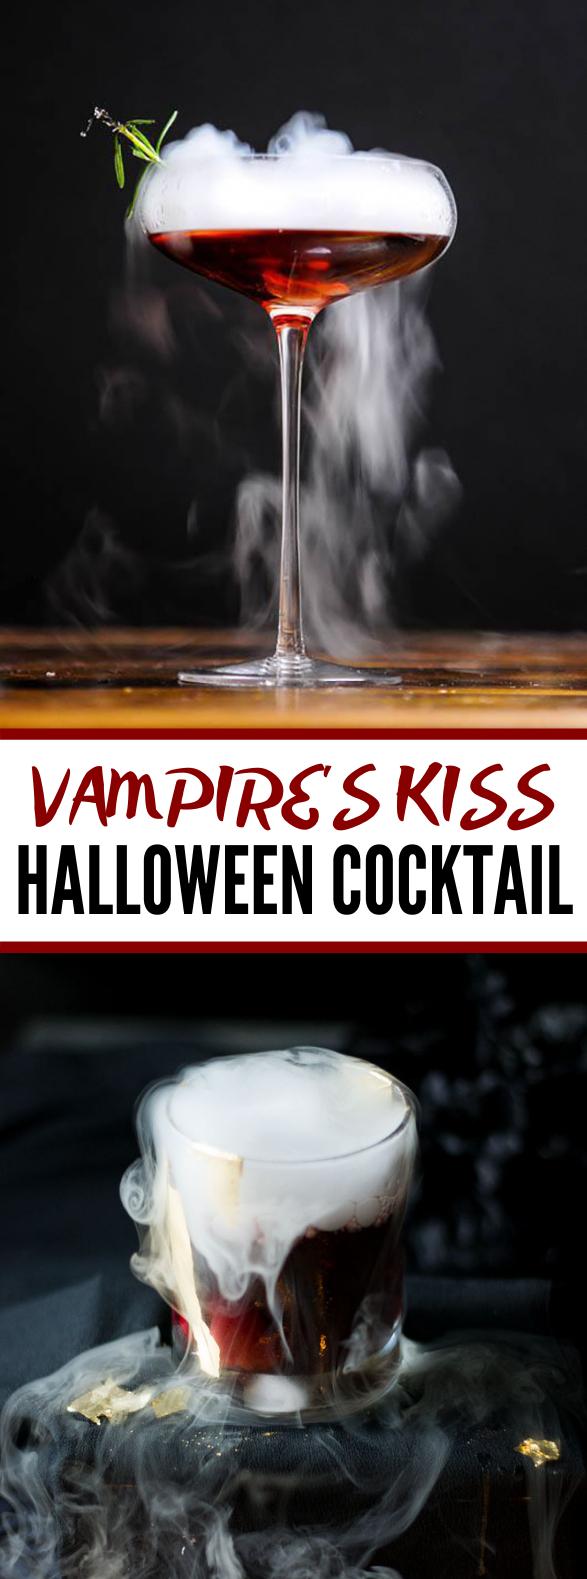 VAMPIRE'S KISS COCKTAIL #mixeddrink #halloweenparty